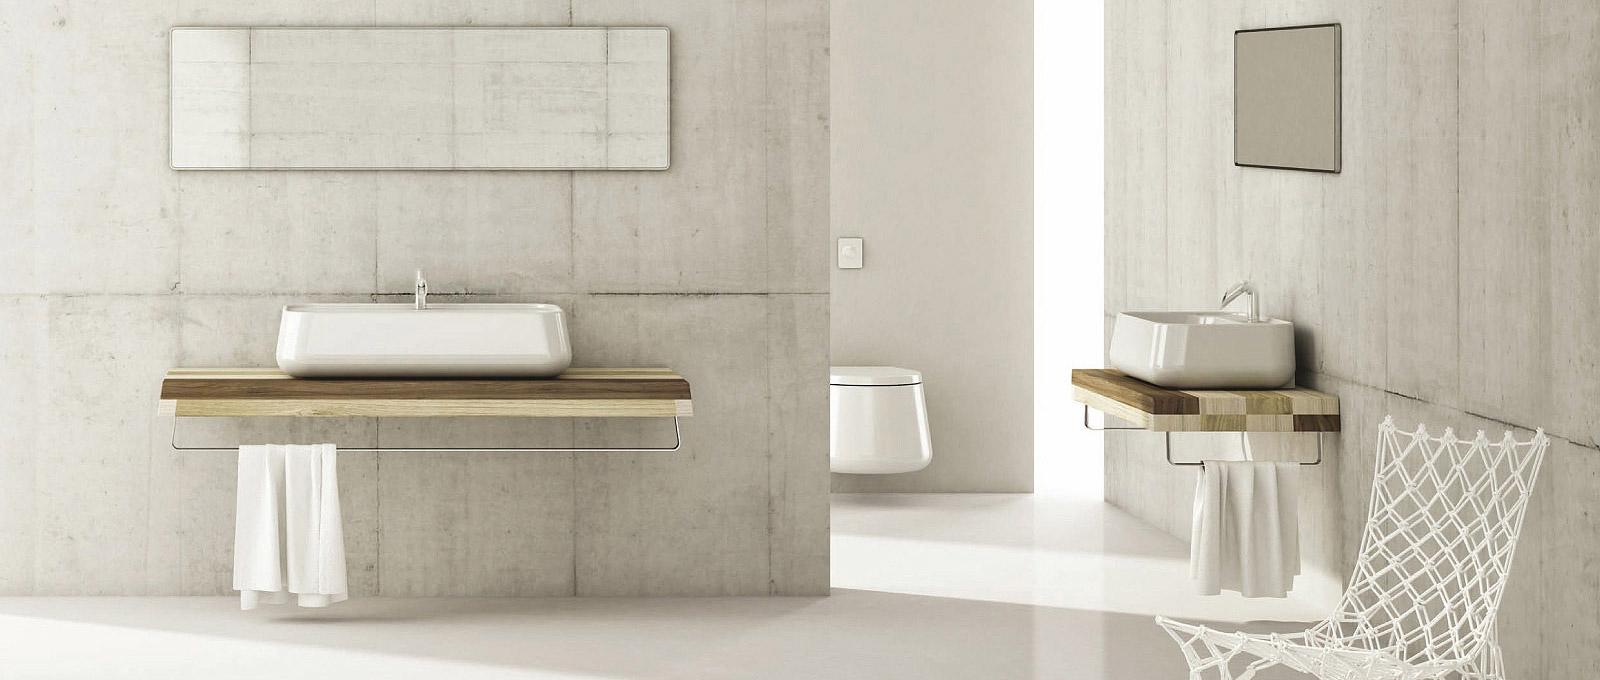 Emejing De Simon Arredamenti Pictures - Home Design Ideas 2017 ...